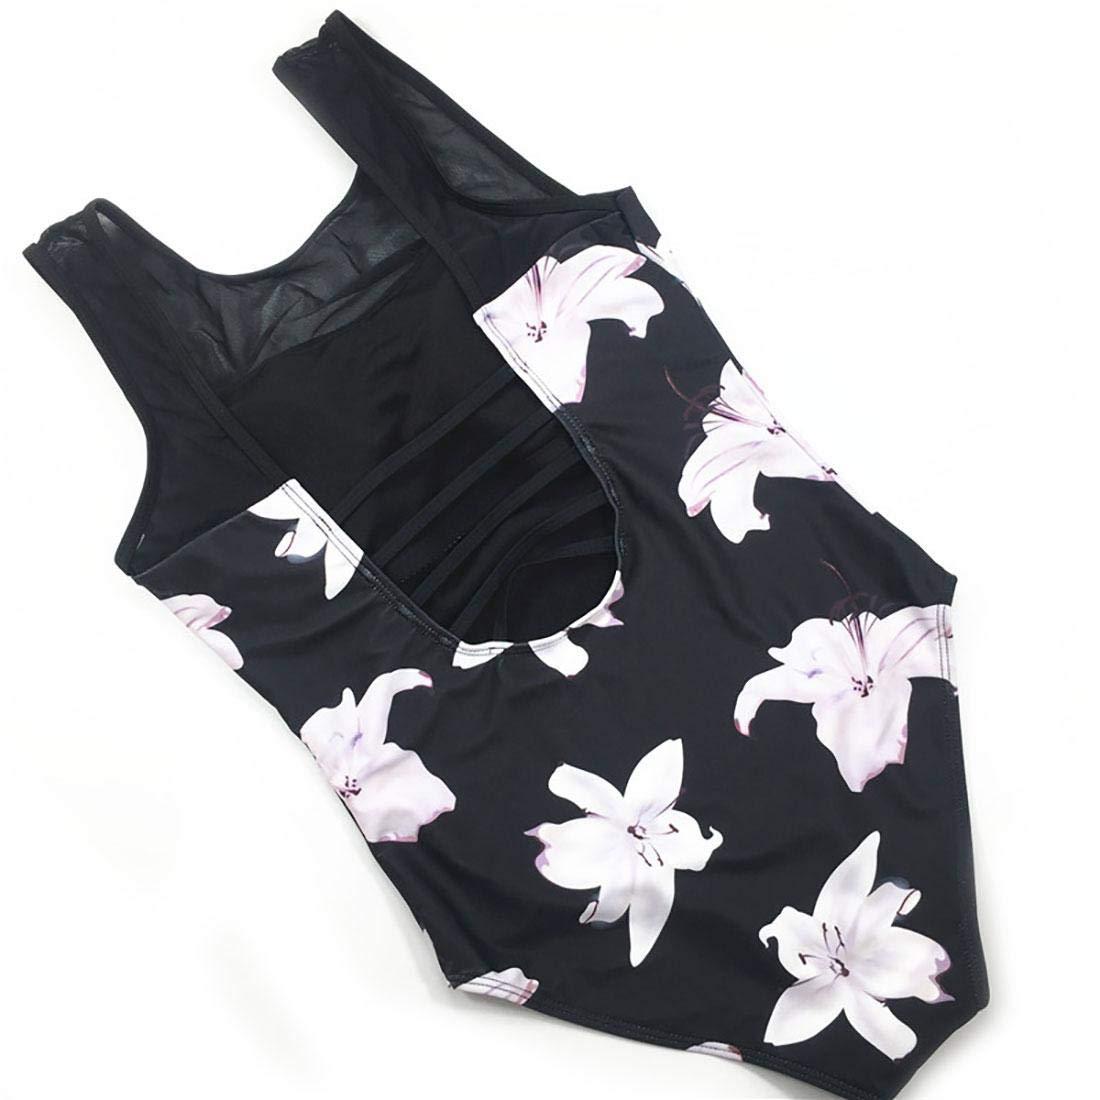 Swimsuit Lxn Womens Bathing Suit One Piece Bikini Gauze Printed Strappy Swimwear Beach Pool